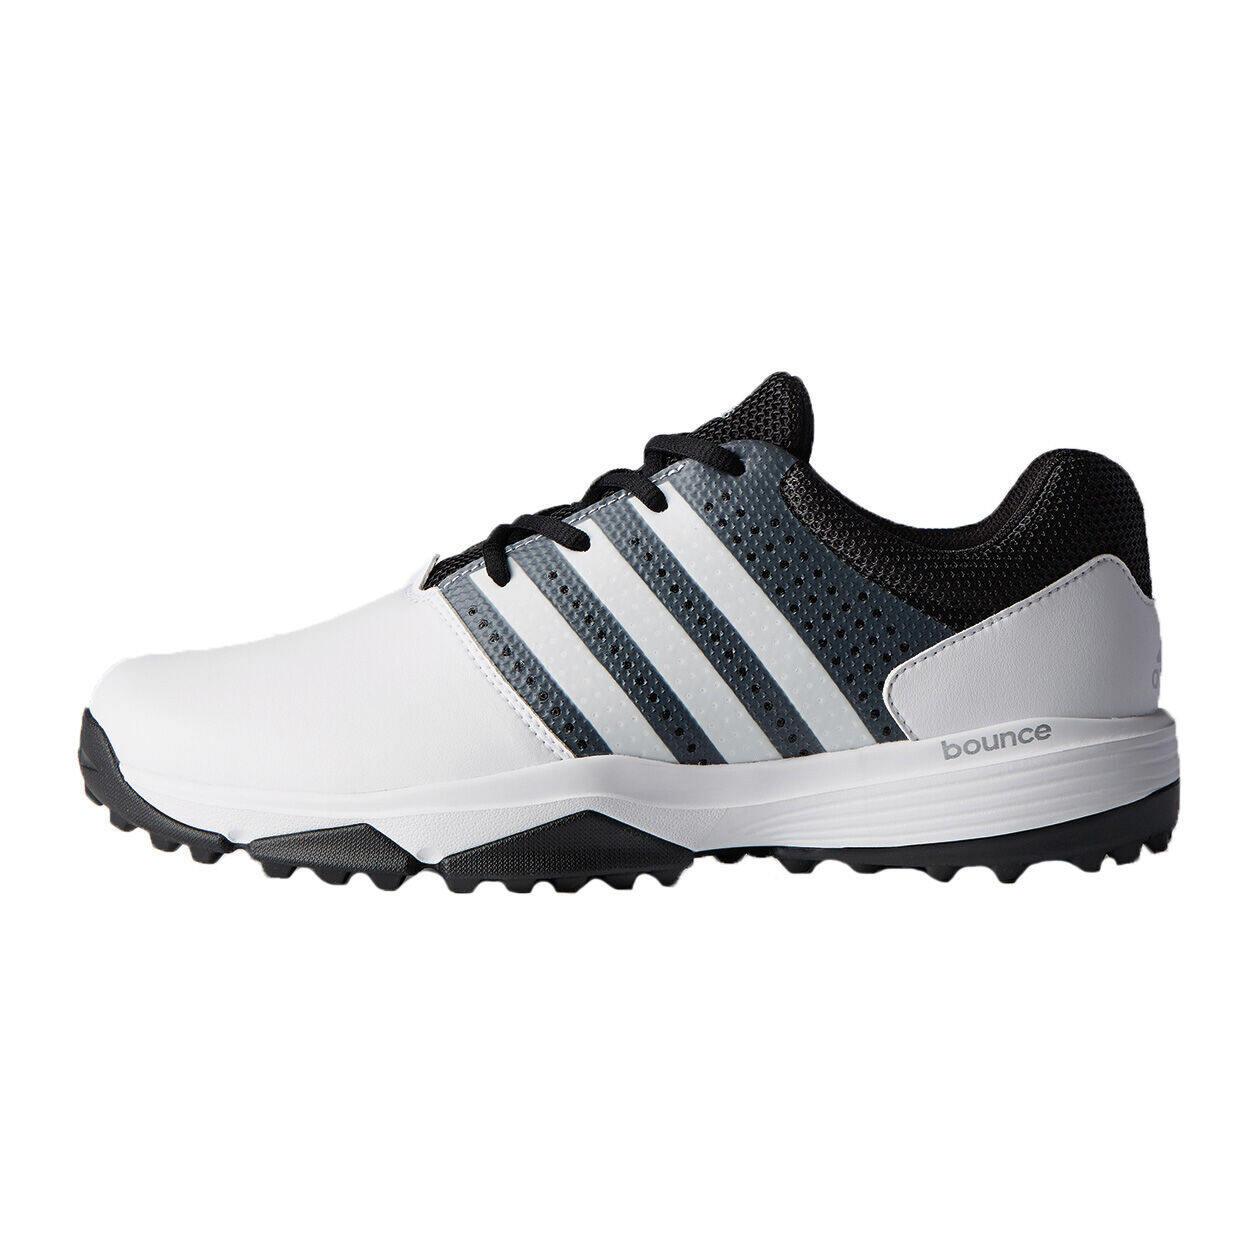 adidas 360 TRAXION Men's Golf Shoe - White/Black